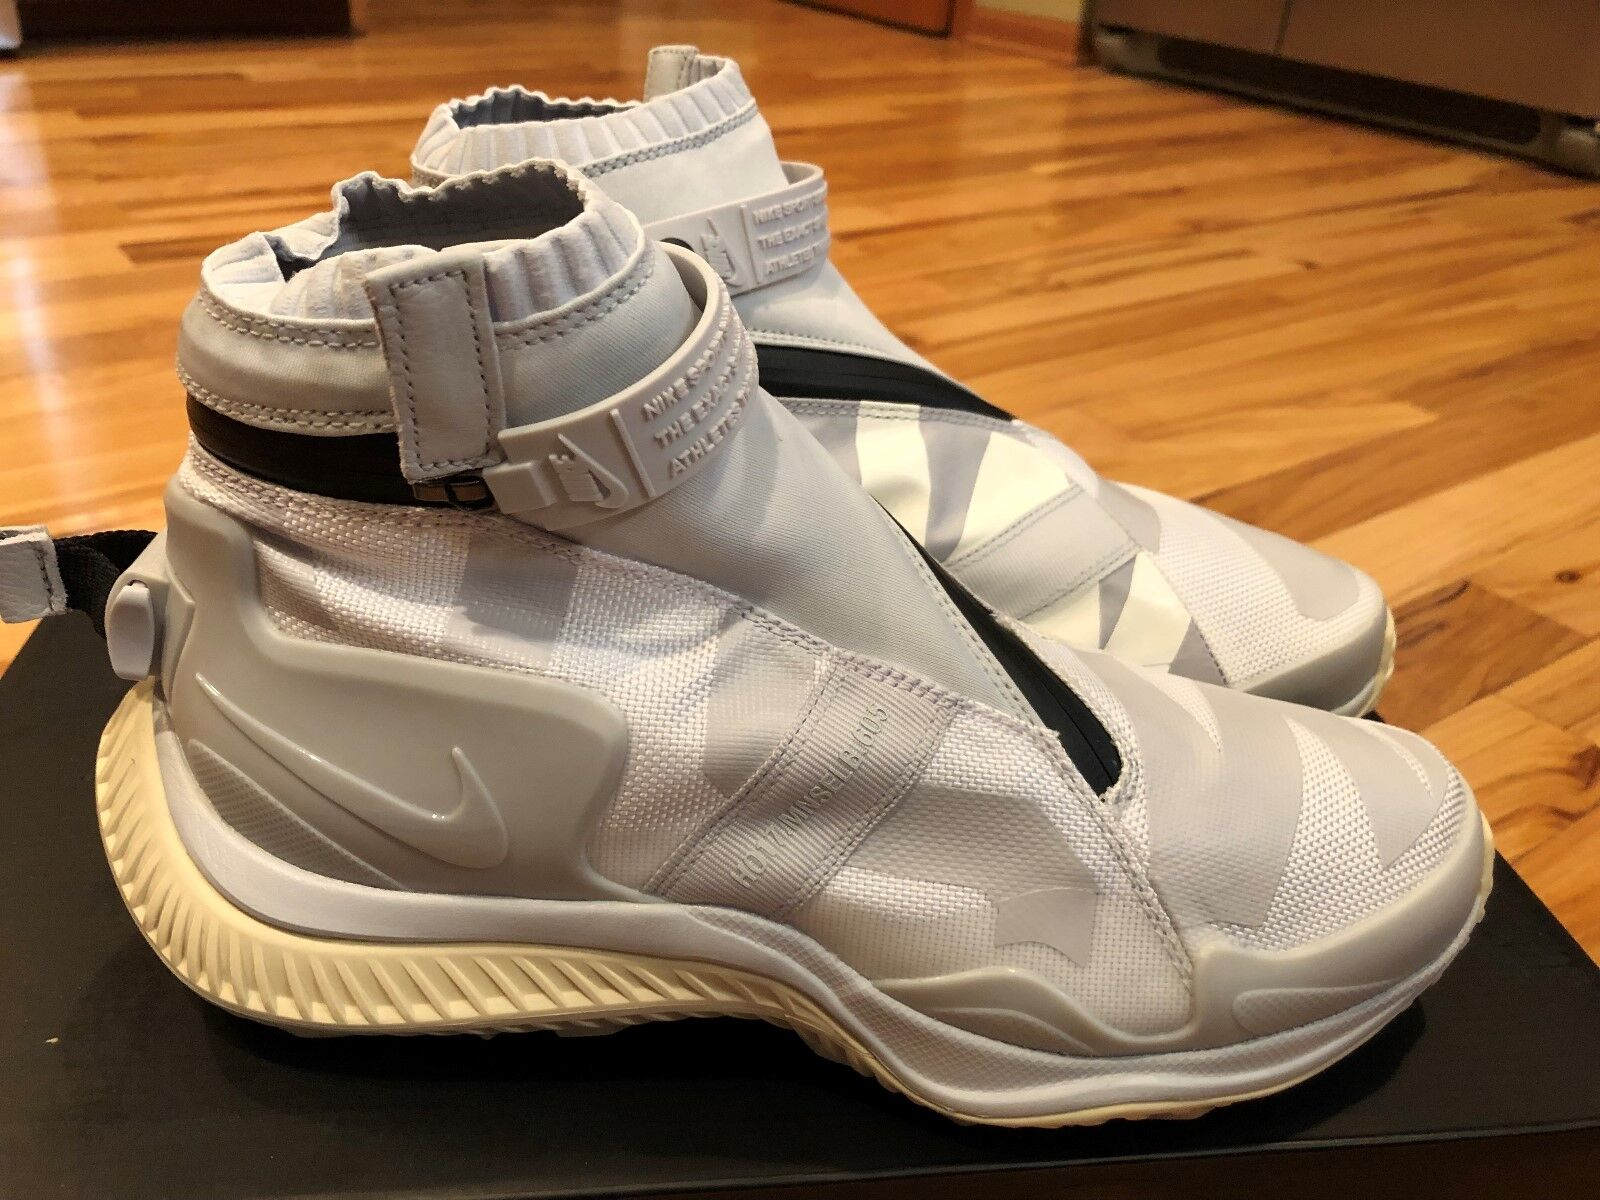 Nike Nikelab NSW Gaiter Boot White Pure Platinum AA0530 100 Men's Size 7